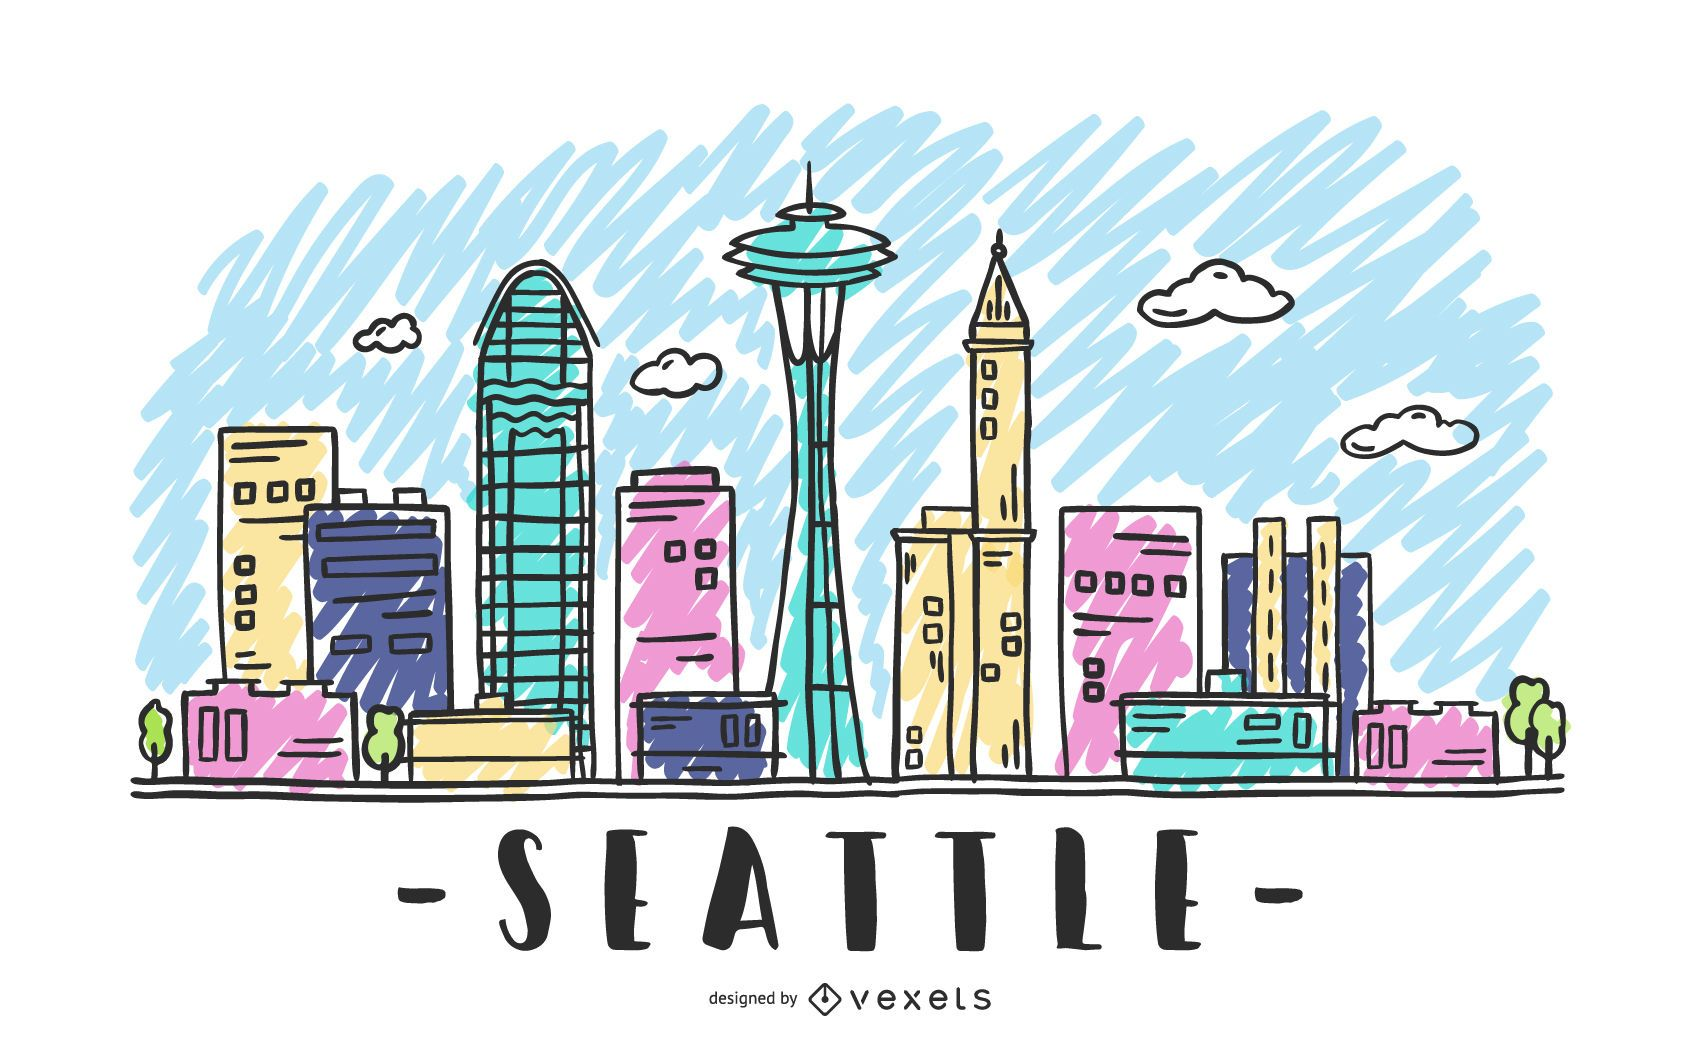 Sketch of Seattle's skyline